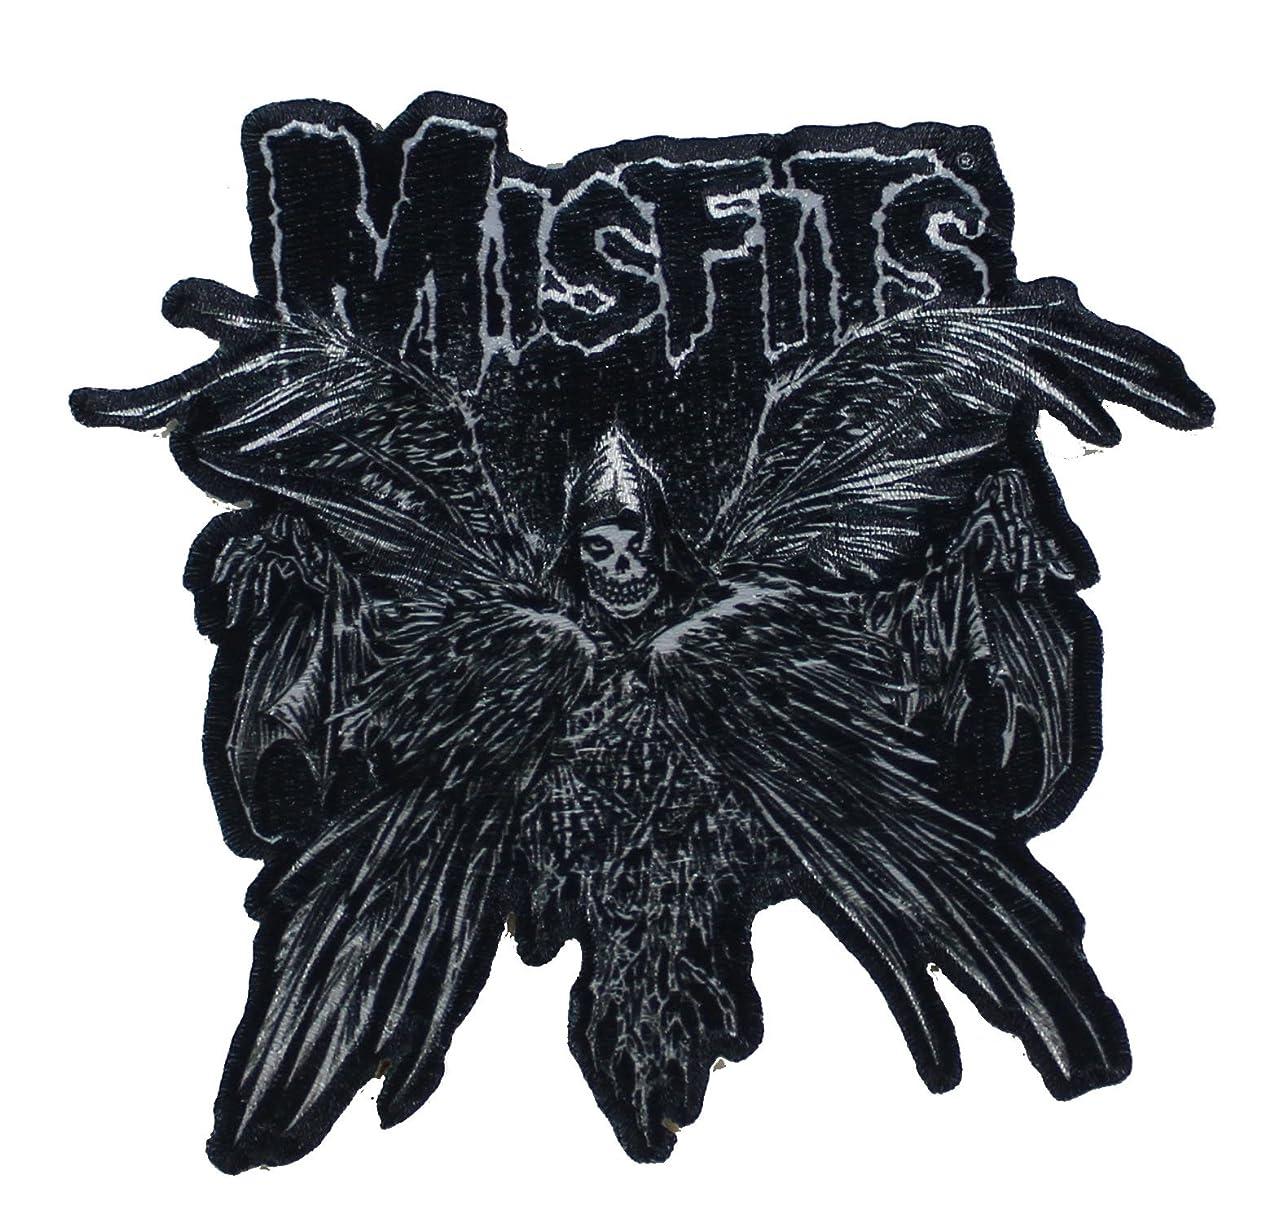 Application Misfits Descending Angel Patch